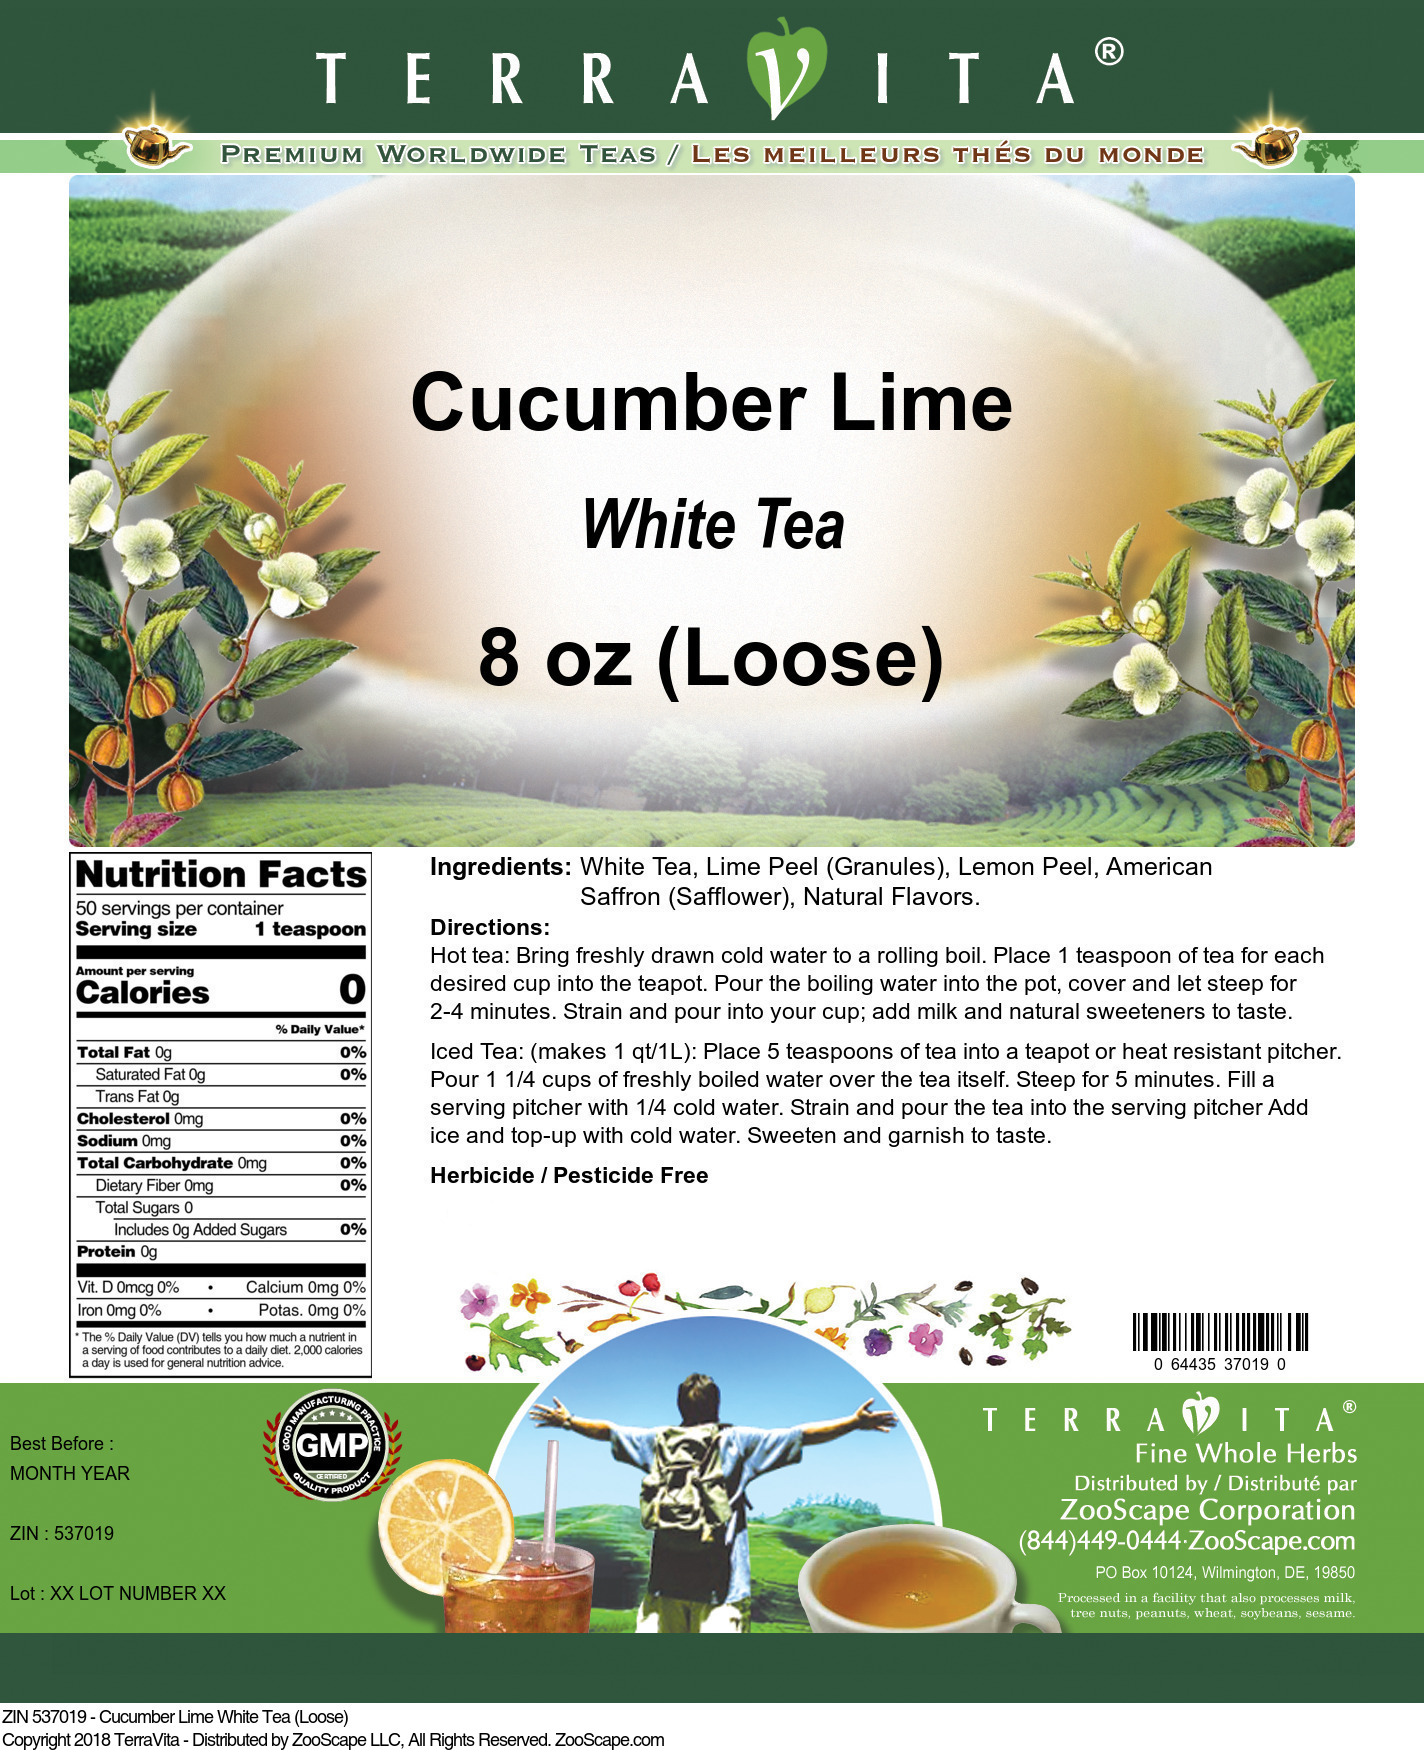 Cucumber Lime White Tea